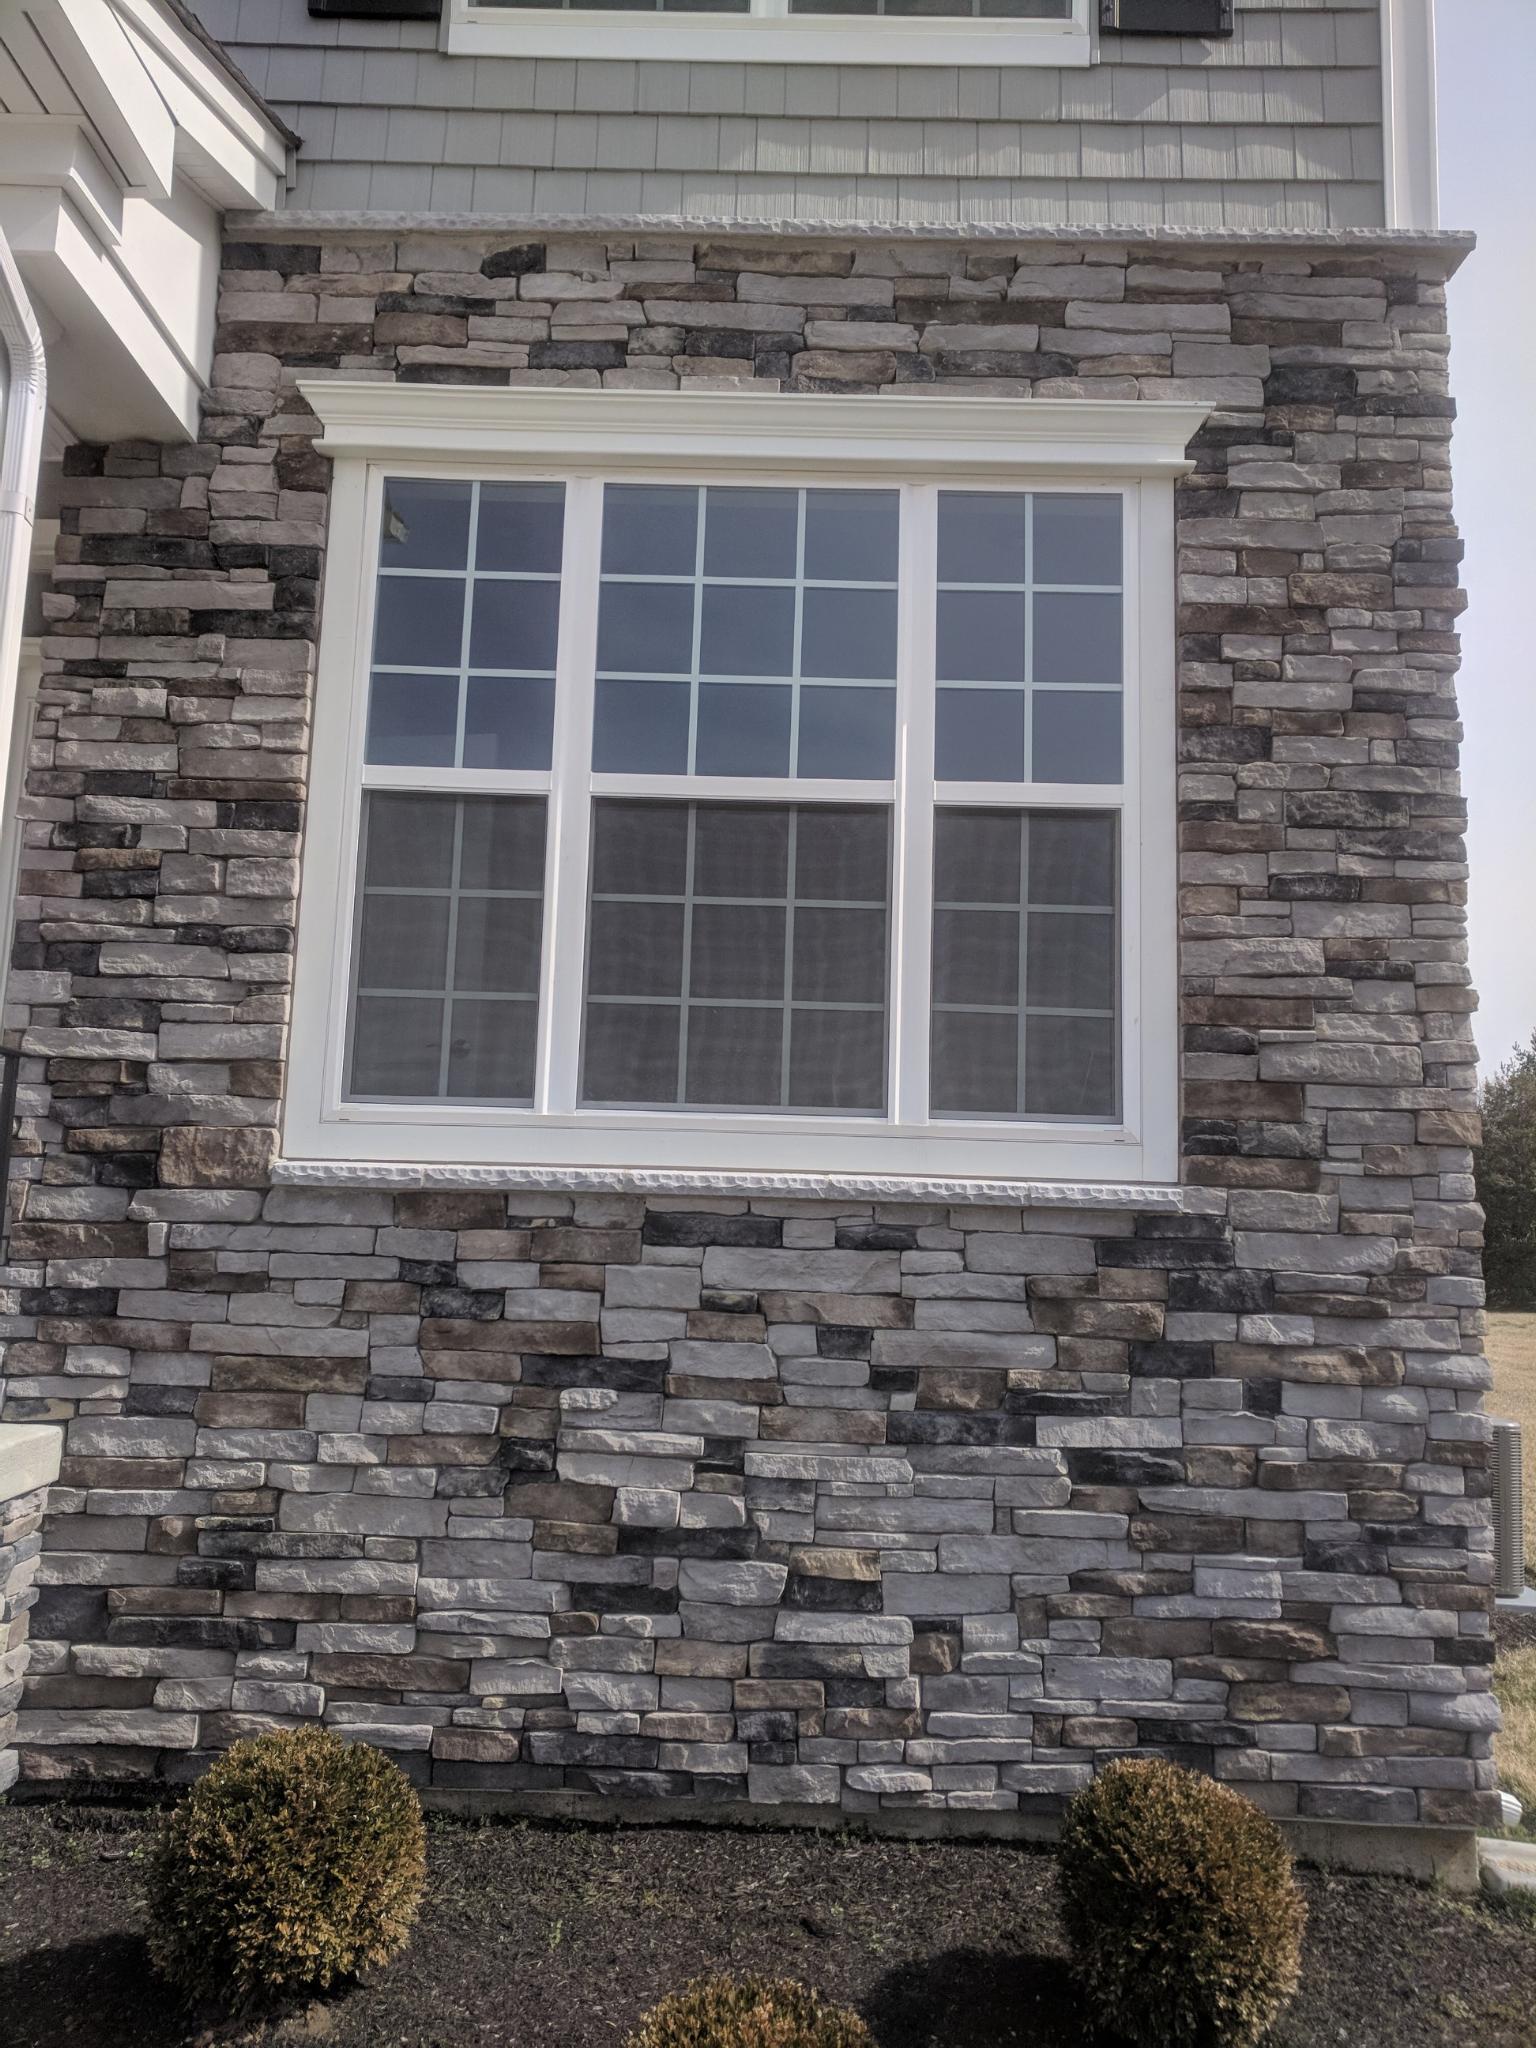 stone: pennsylvania ledgestone. installer: stone masons LLC